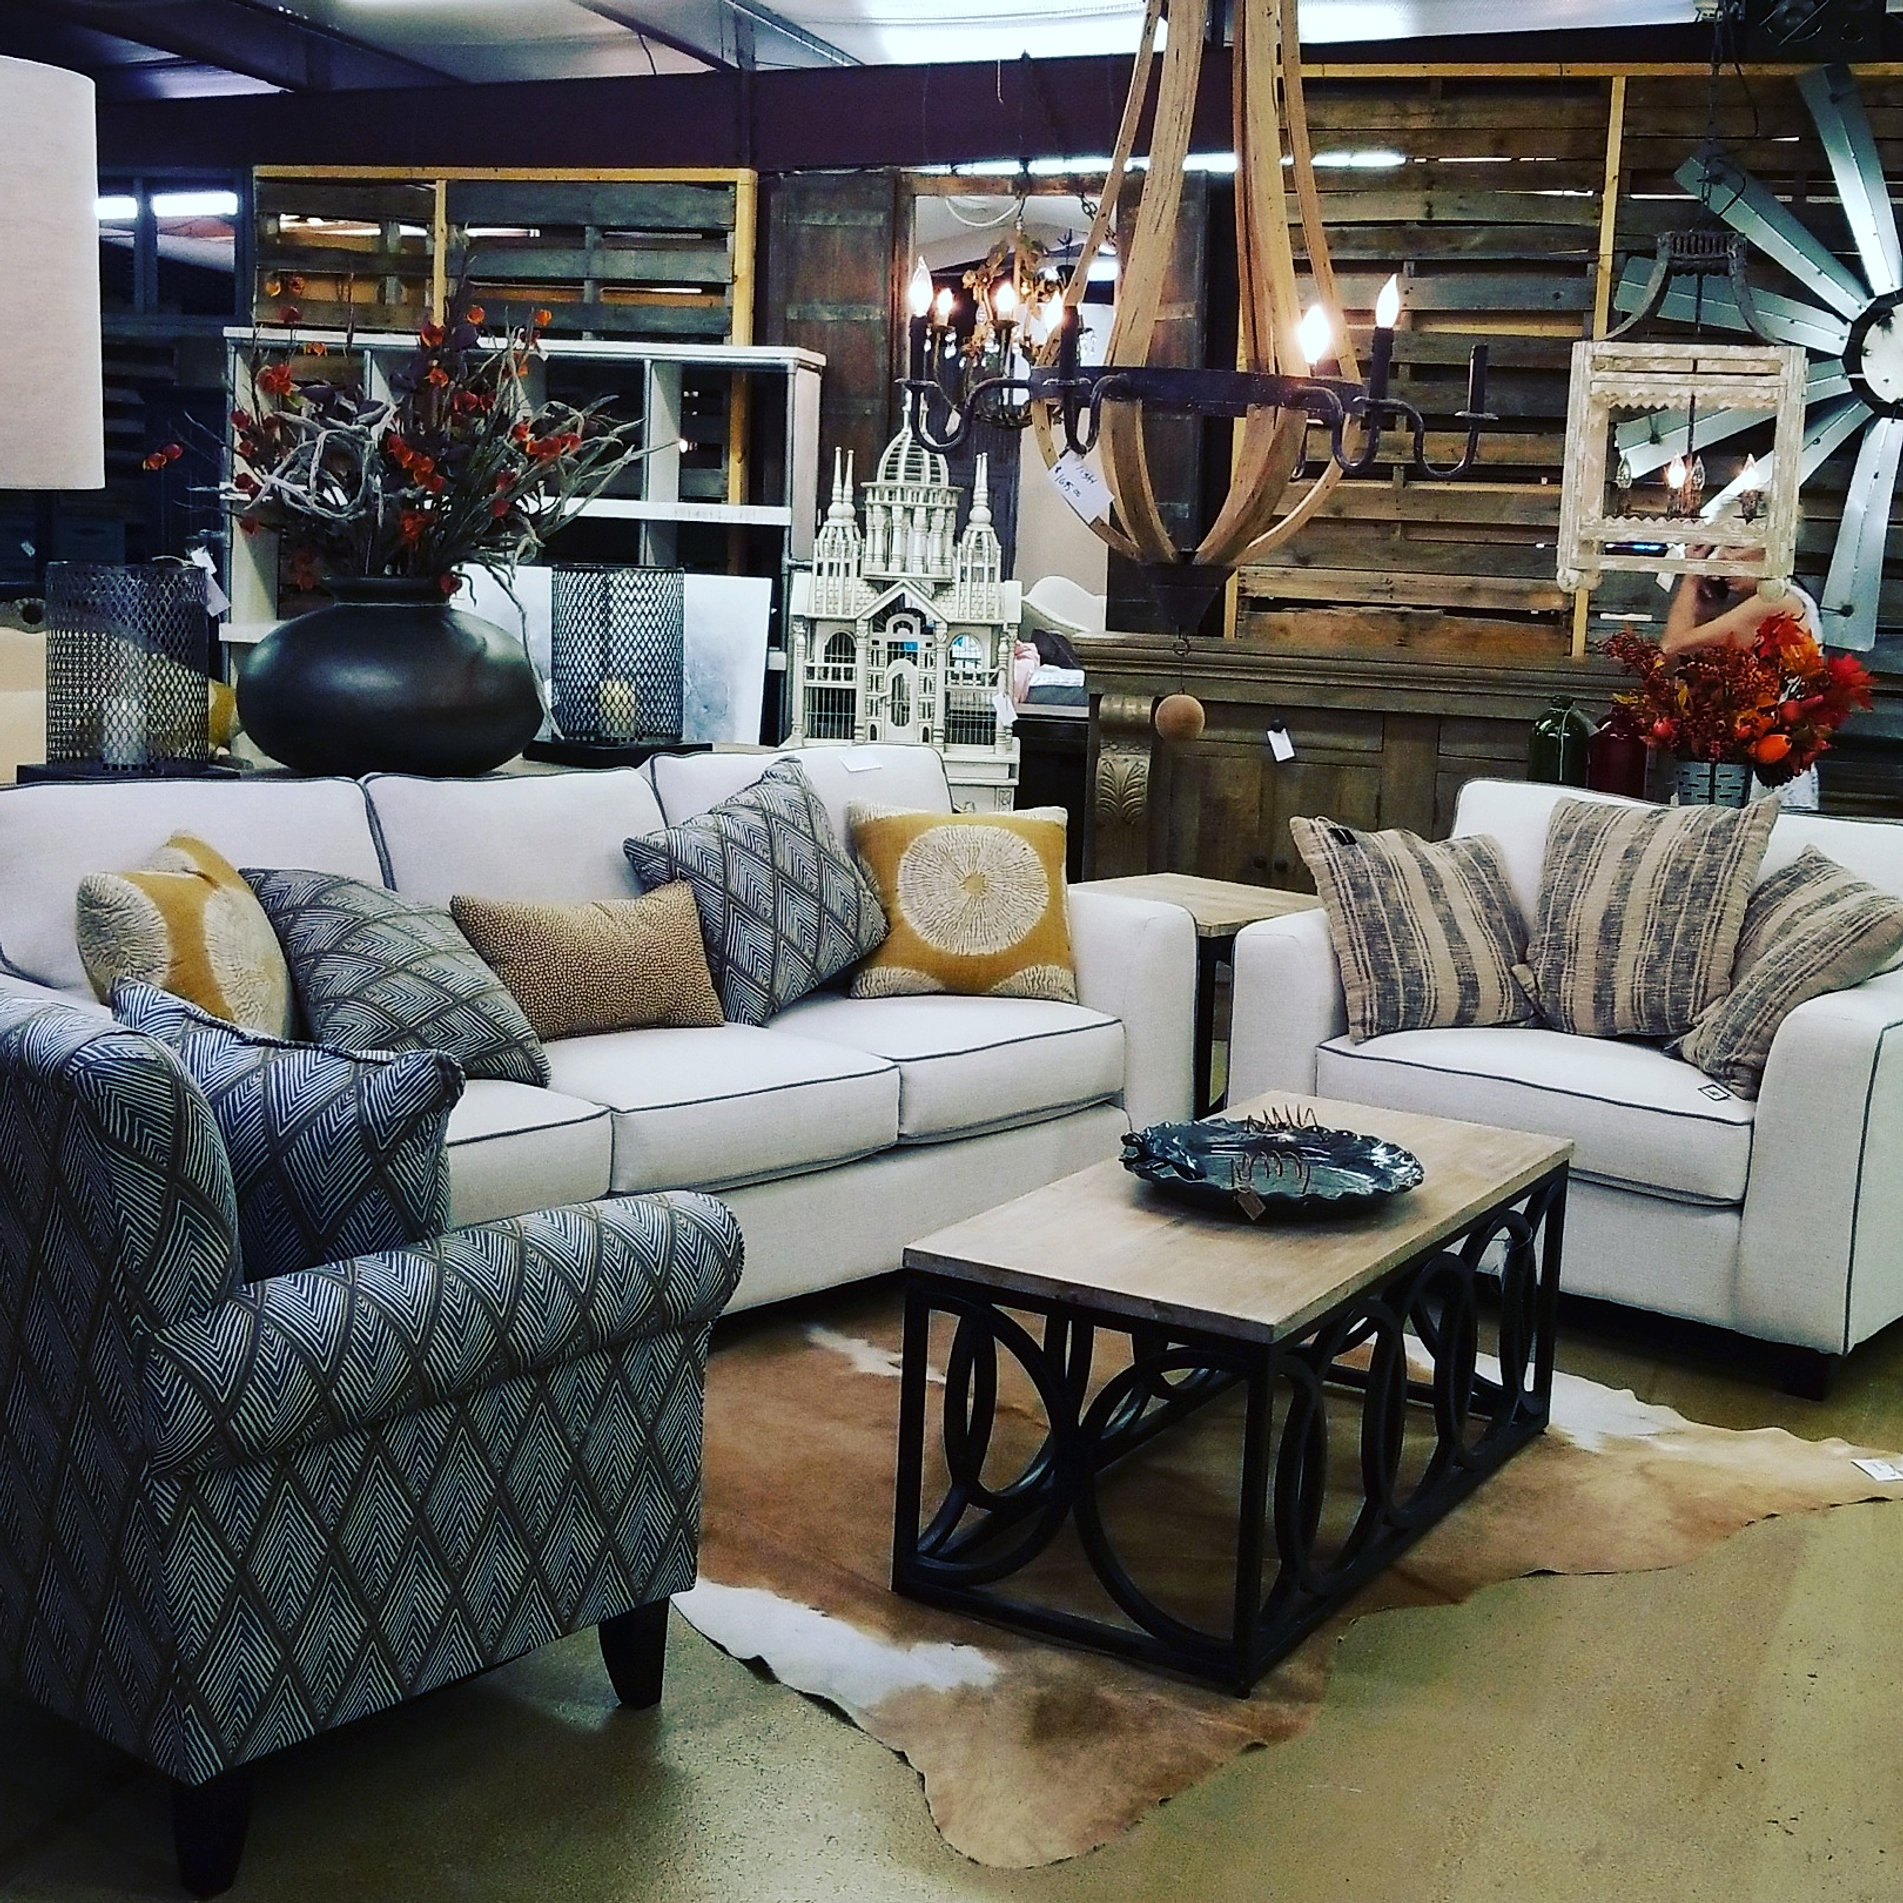 Superb Gallery Of N N Img Img With Furniture Stores Dothan Alabama